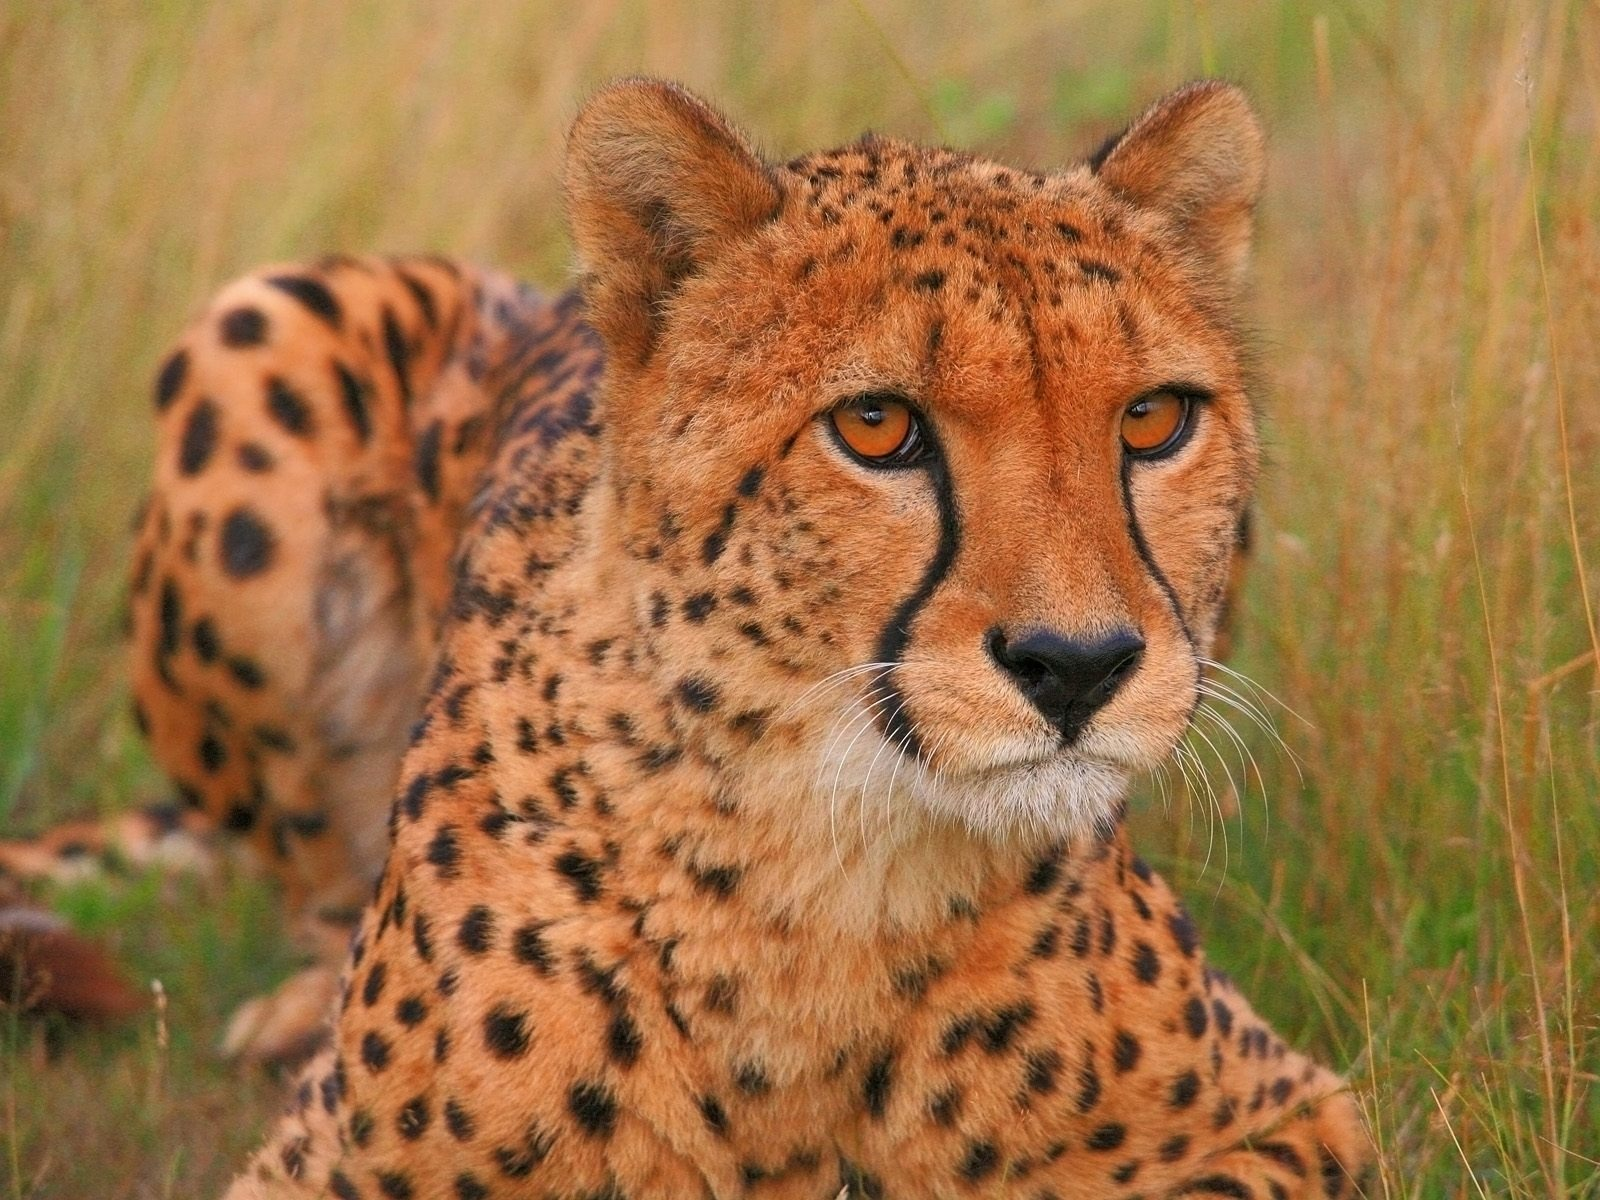 Pepo the Cheetah Wallpaper Cheetahs Animals Wallpapers